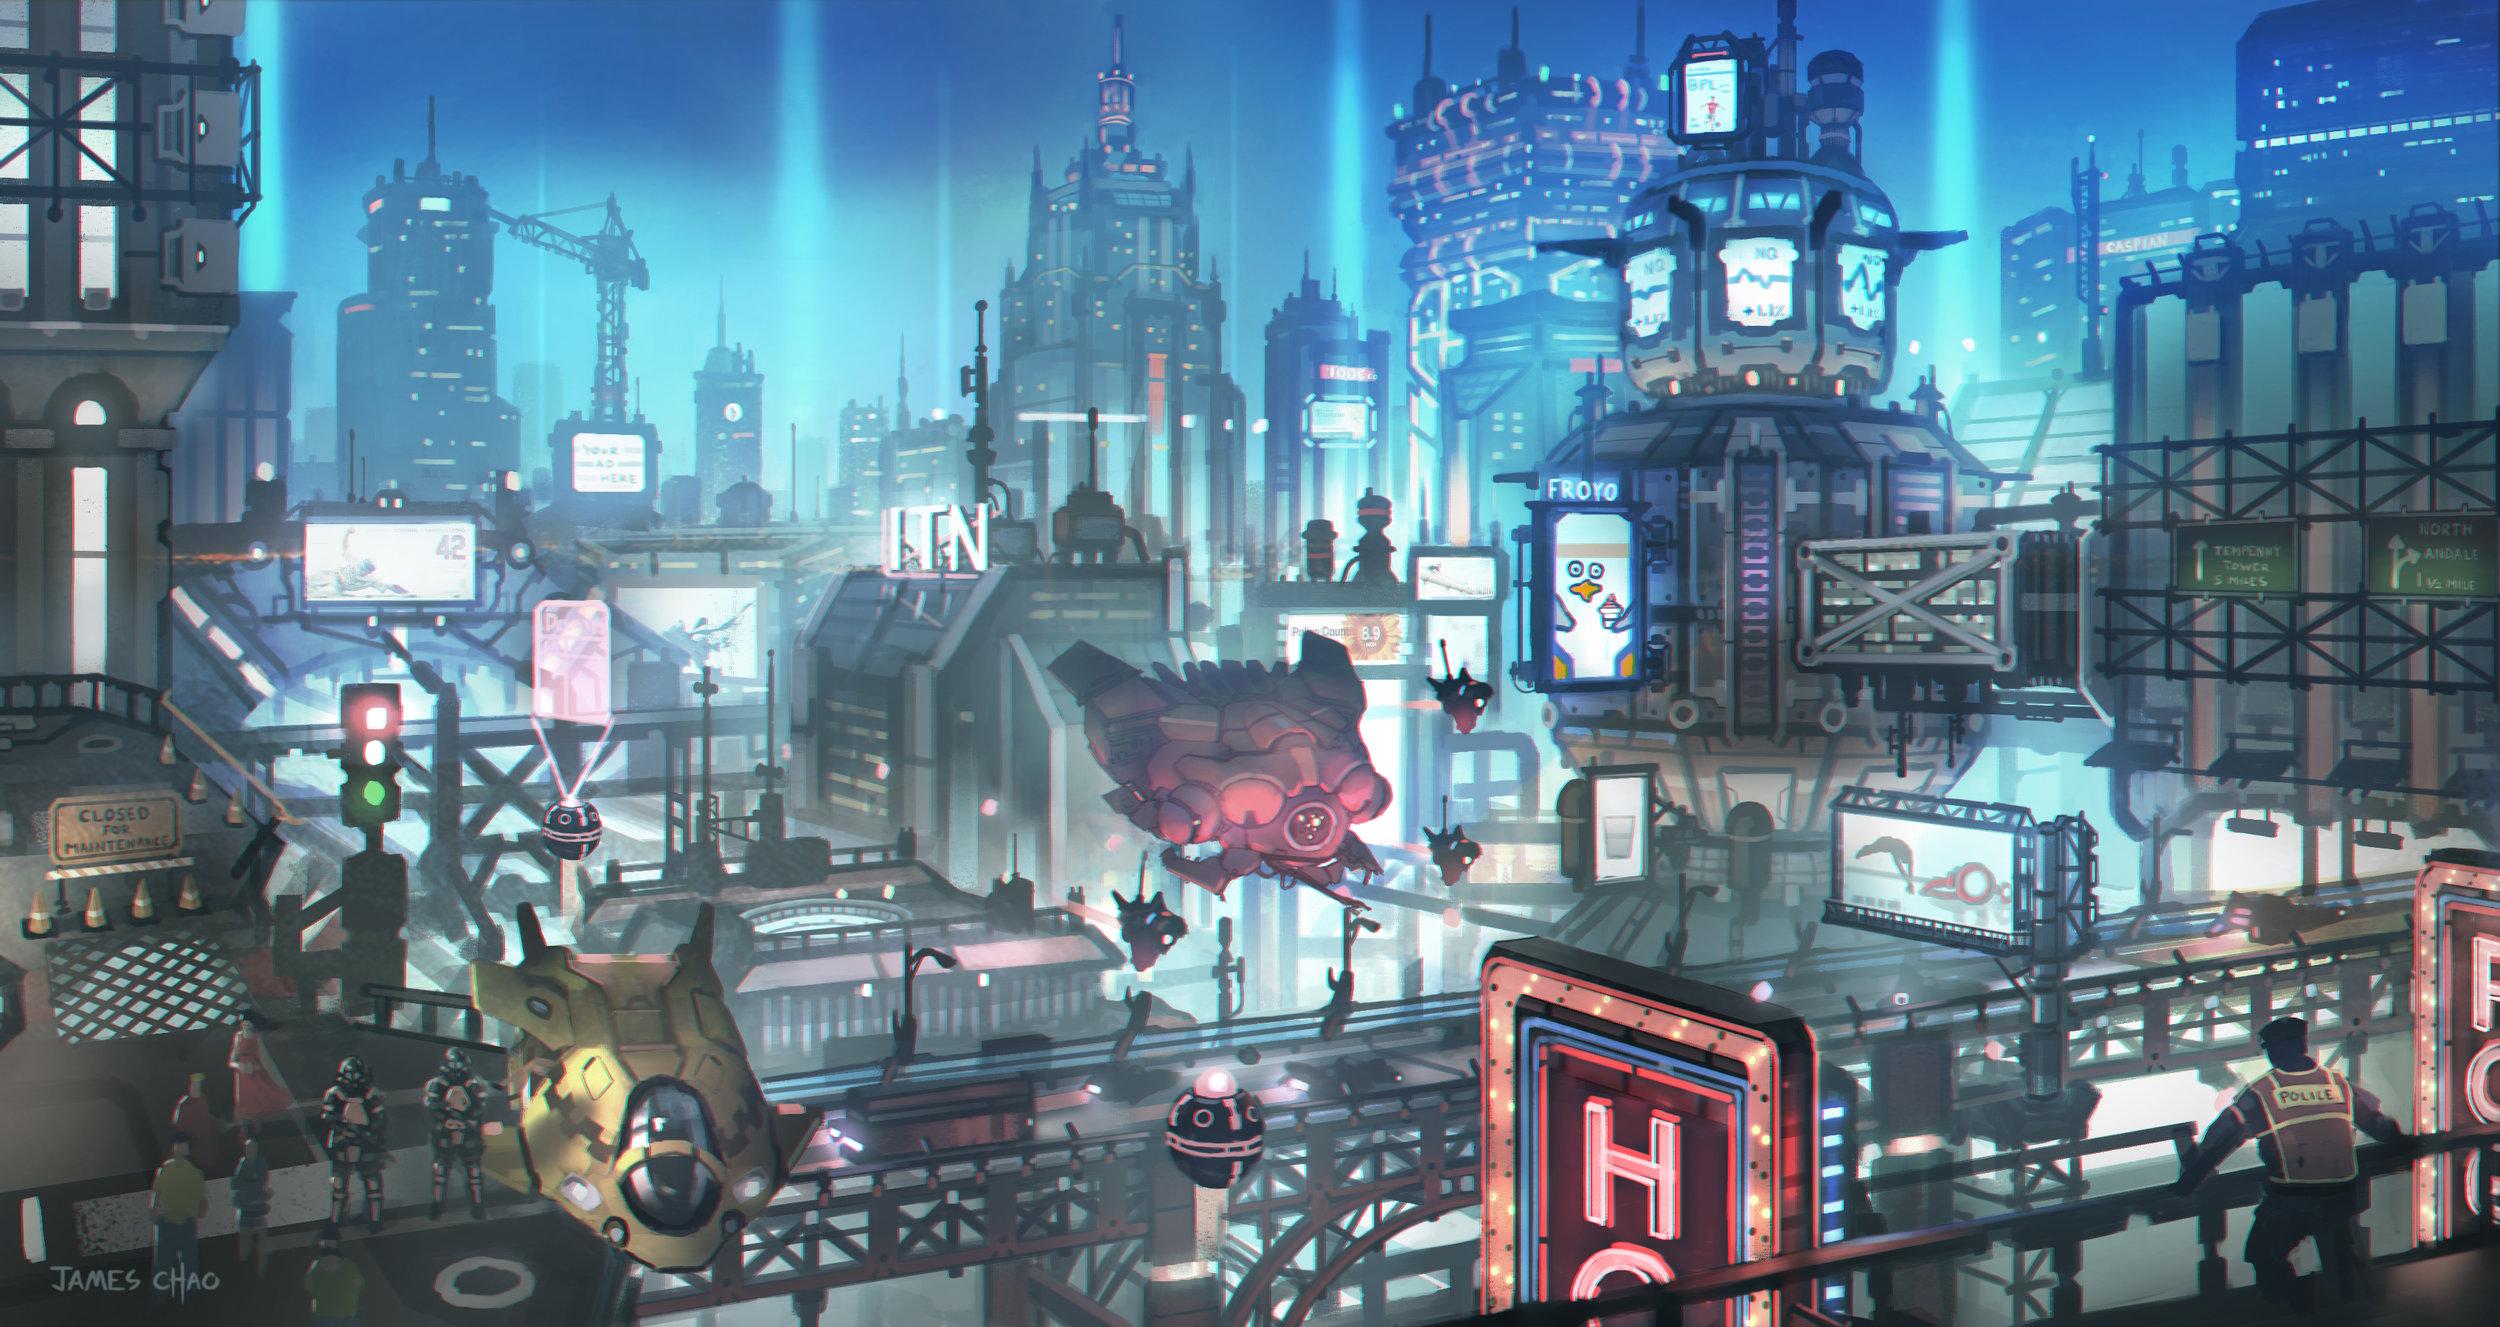 James_Chao_Futuristic_City